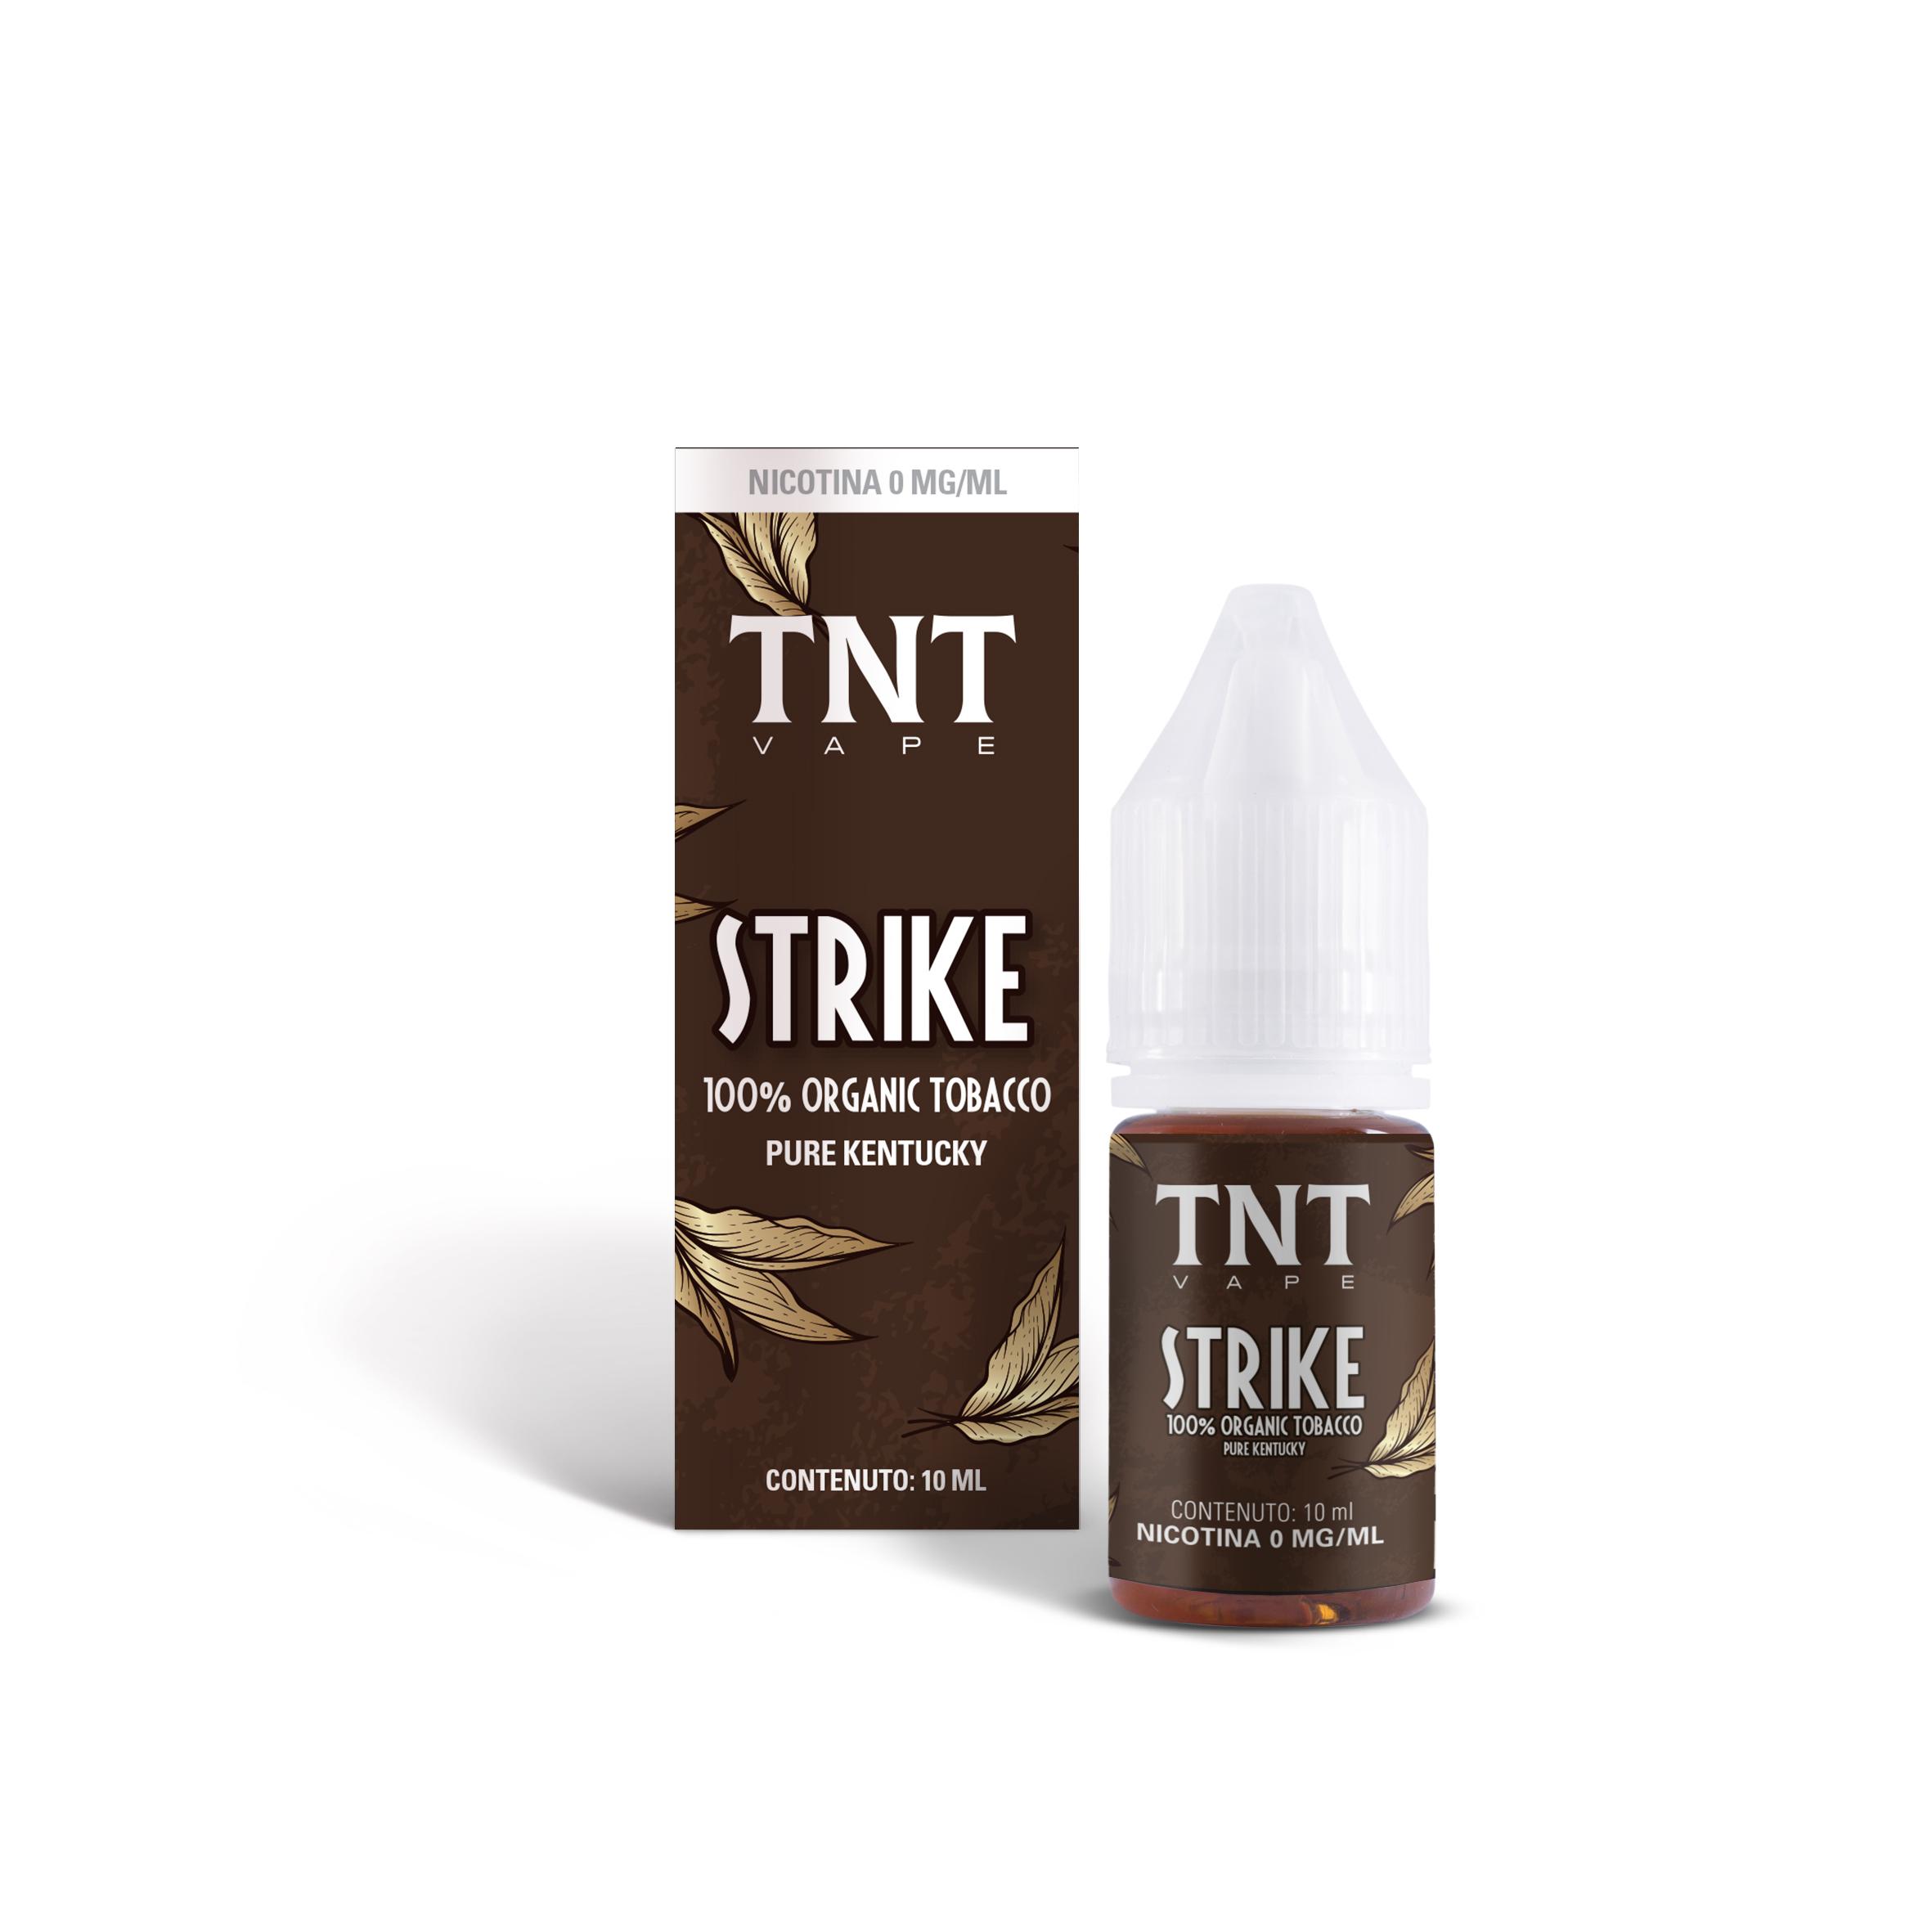 TNT Vape Strike 10 ml Liquido Pronto Nicotina